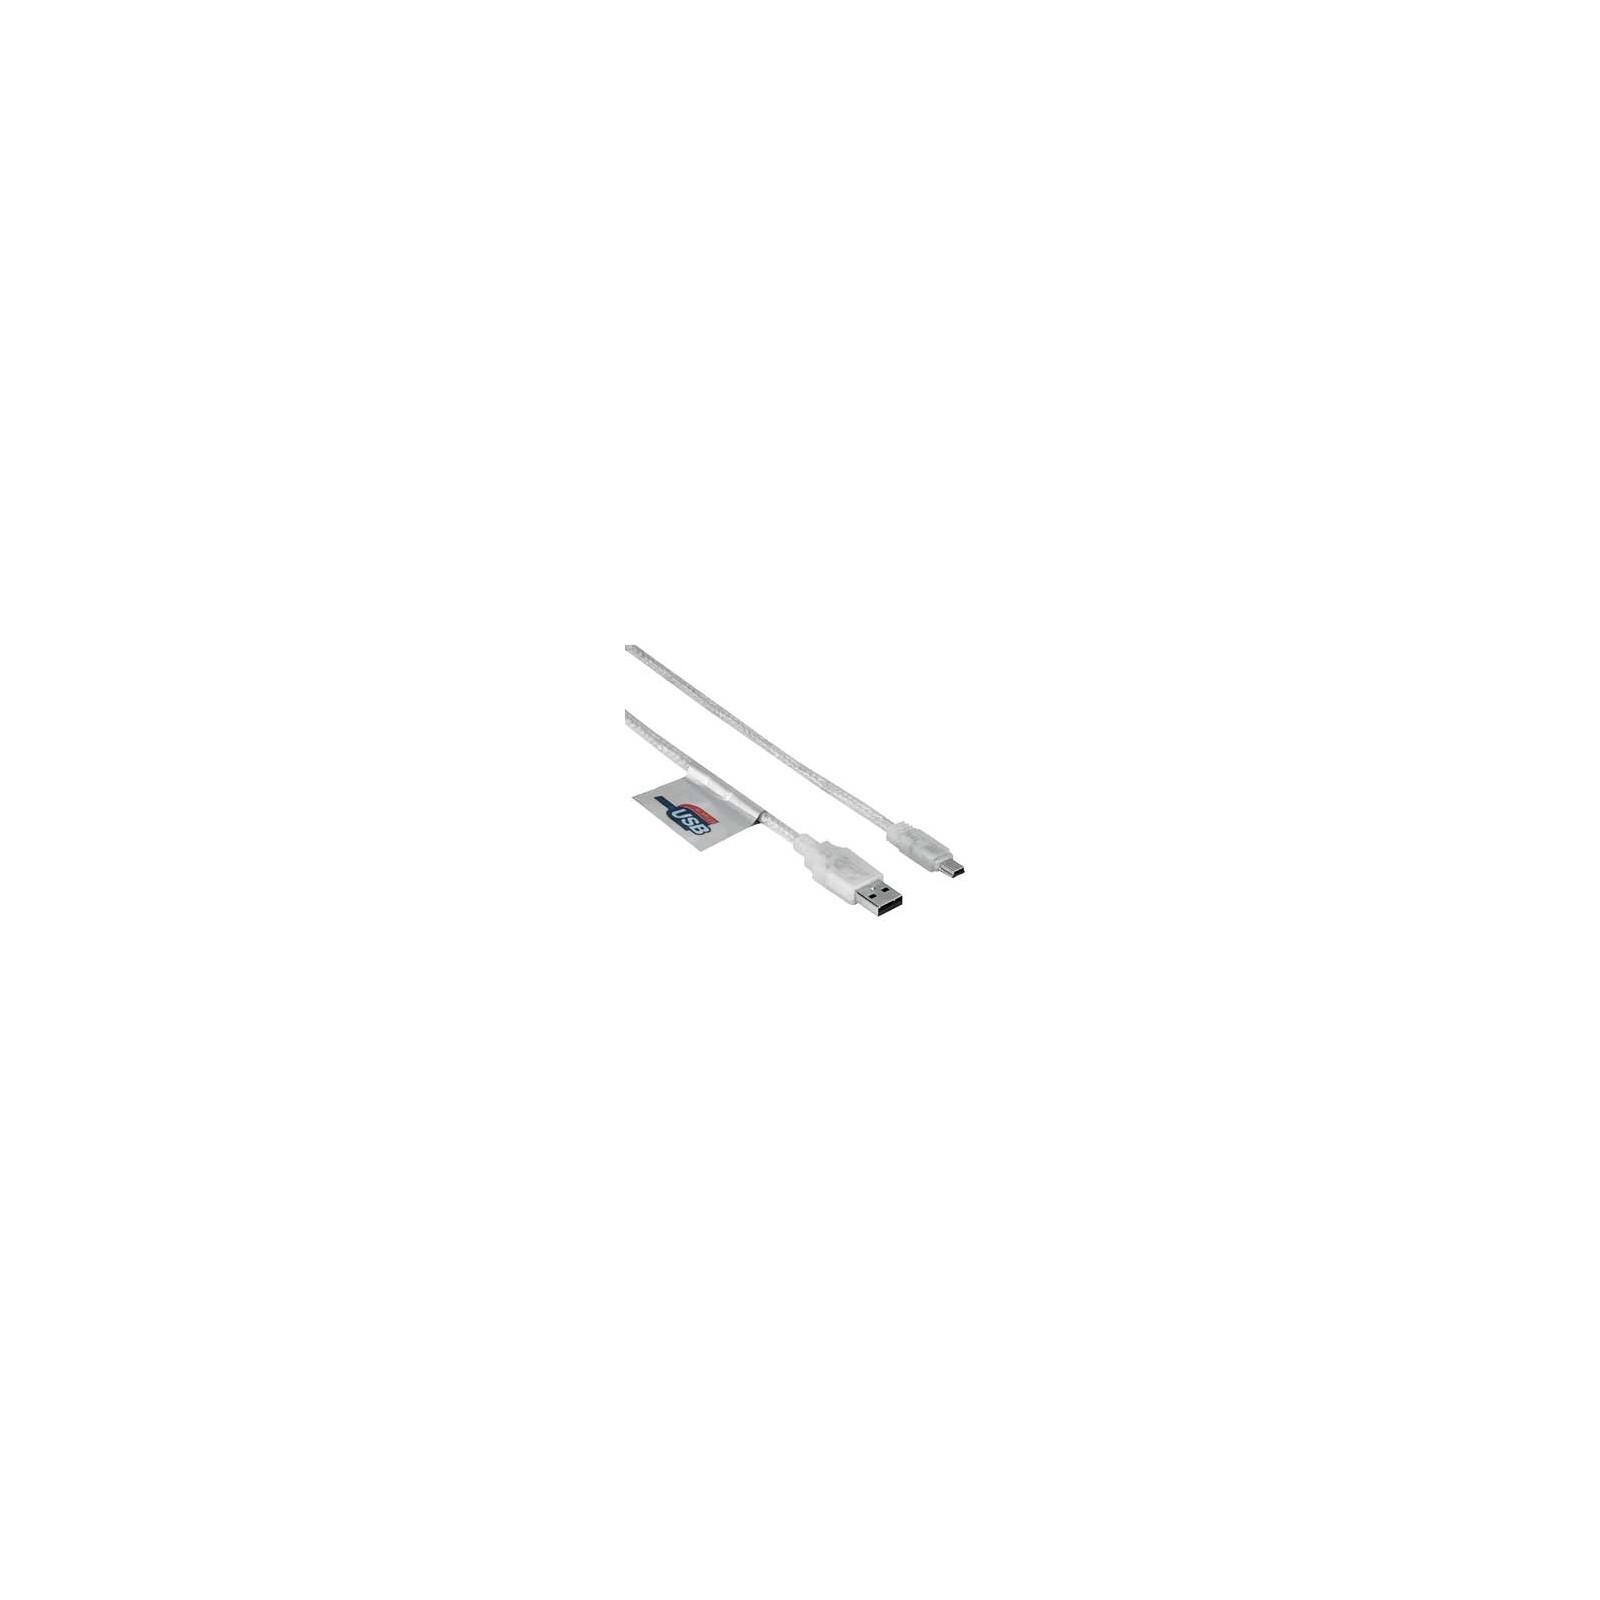 Hama 41533 Mini-USB-2.0-Kabel, vergoldet, doppelt geschirmt,